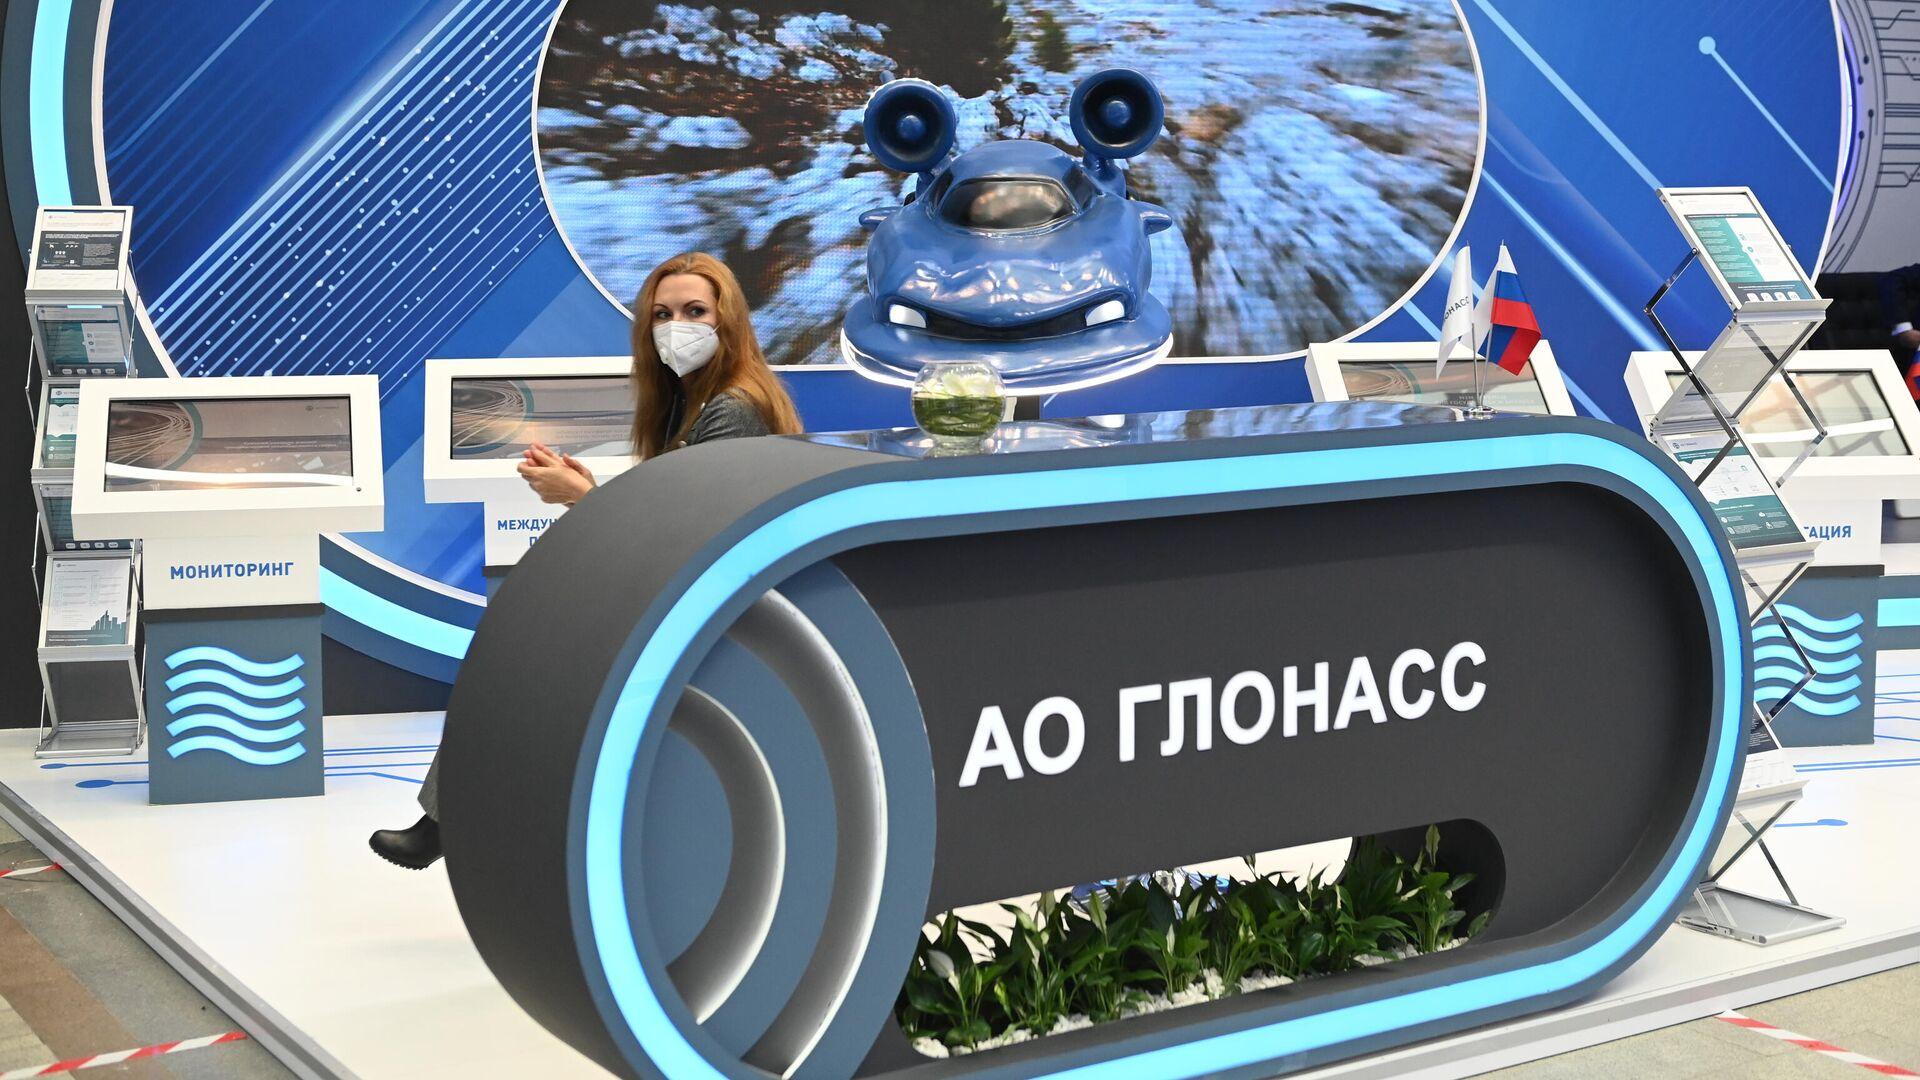 Стенд АО Глонасс на XIV Международном форуме Транспорт России - РИА Новости, 1920, 28.06.2021